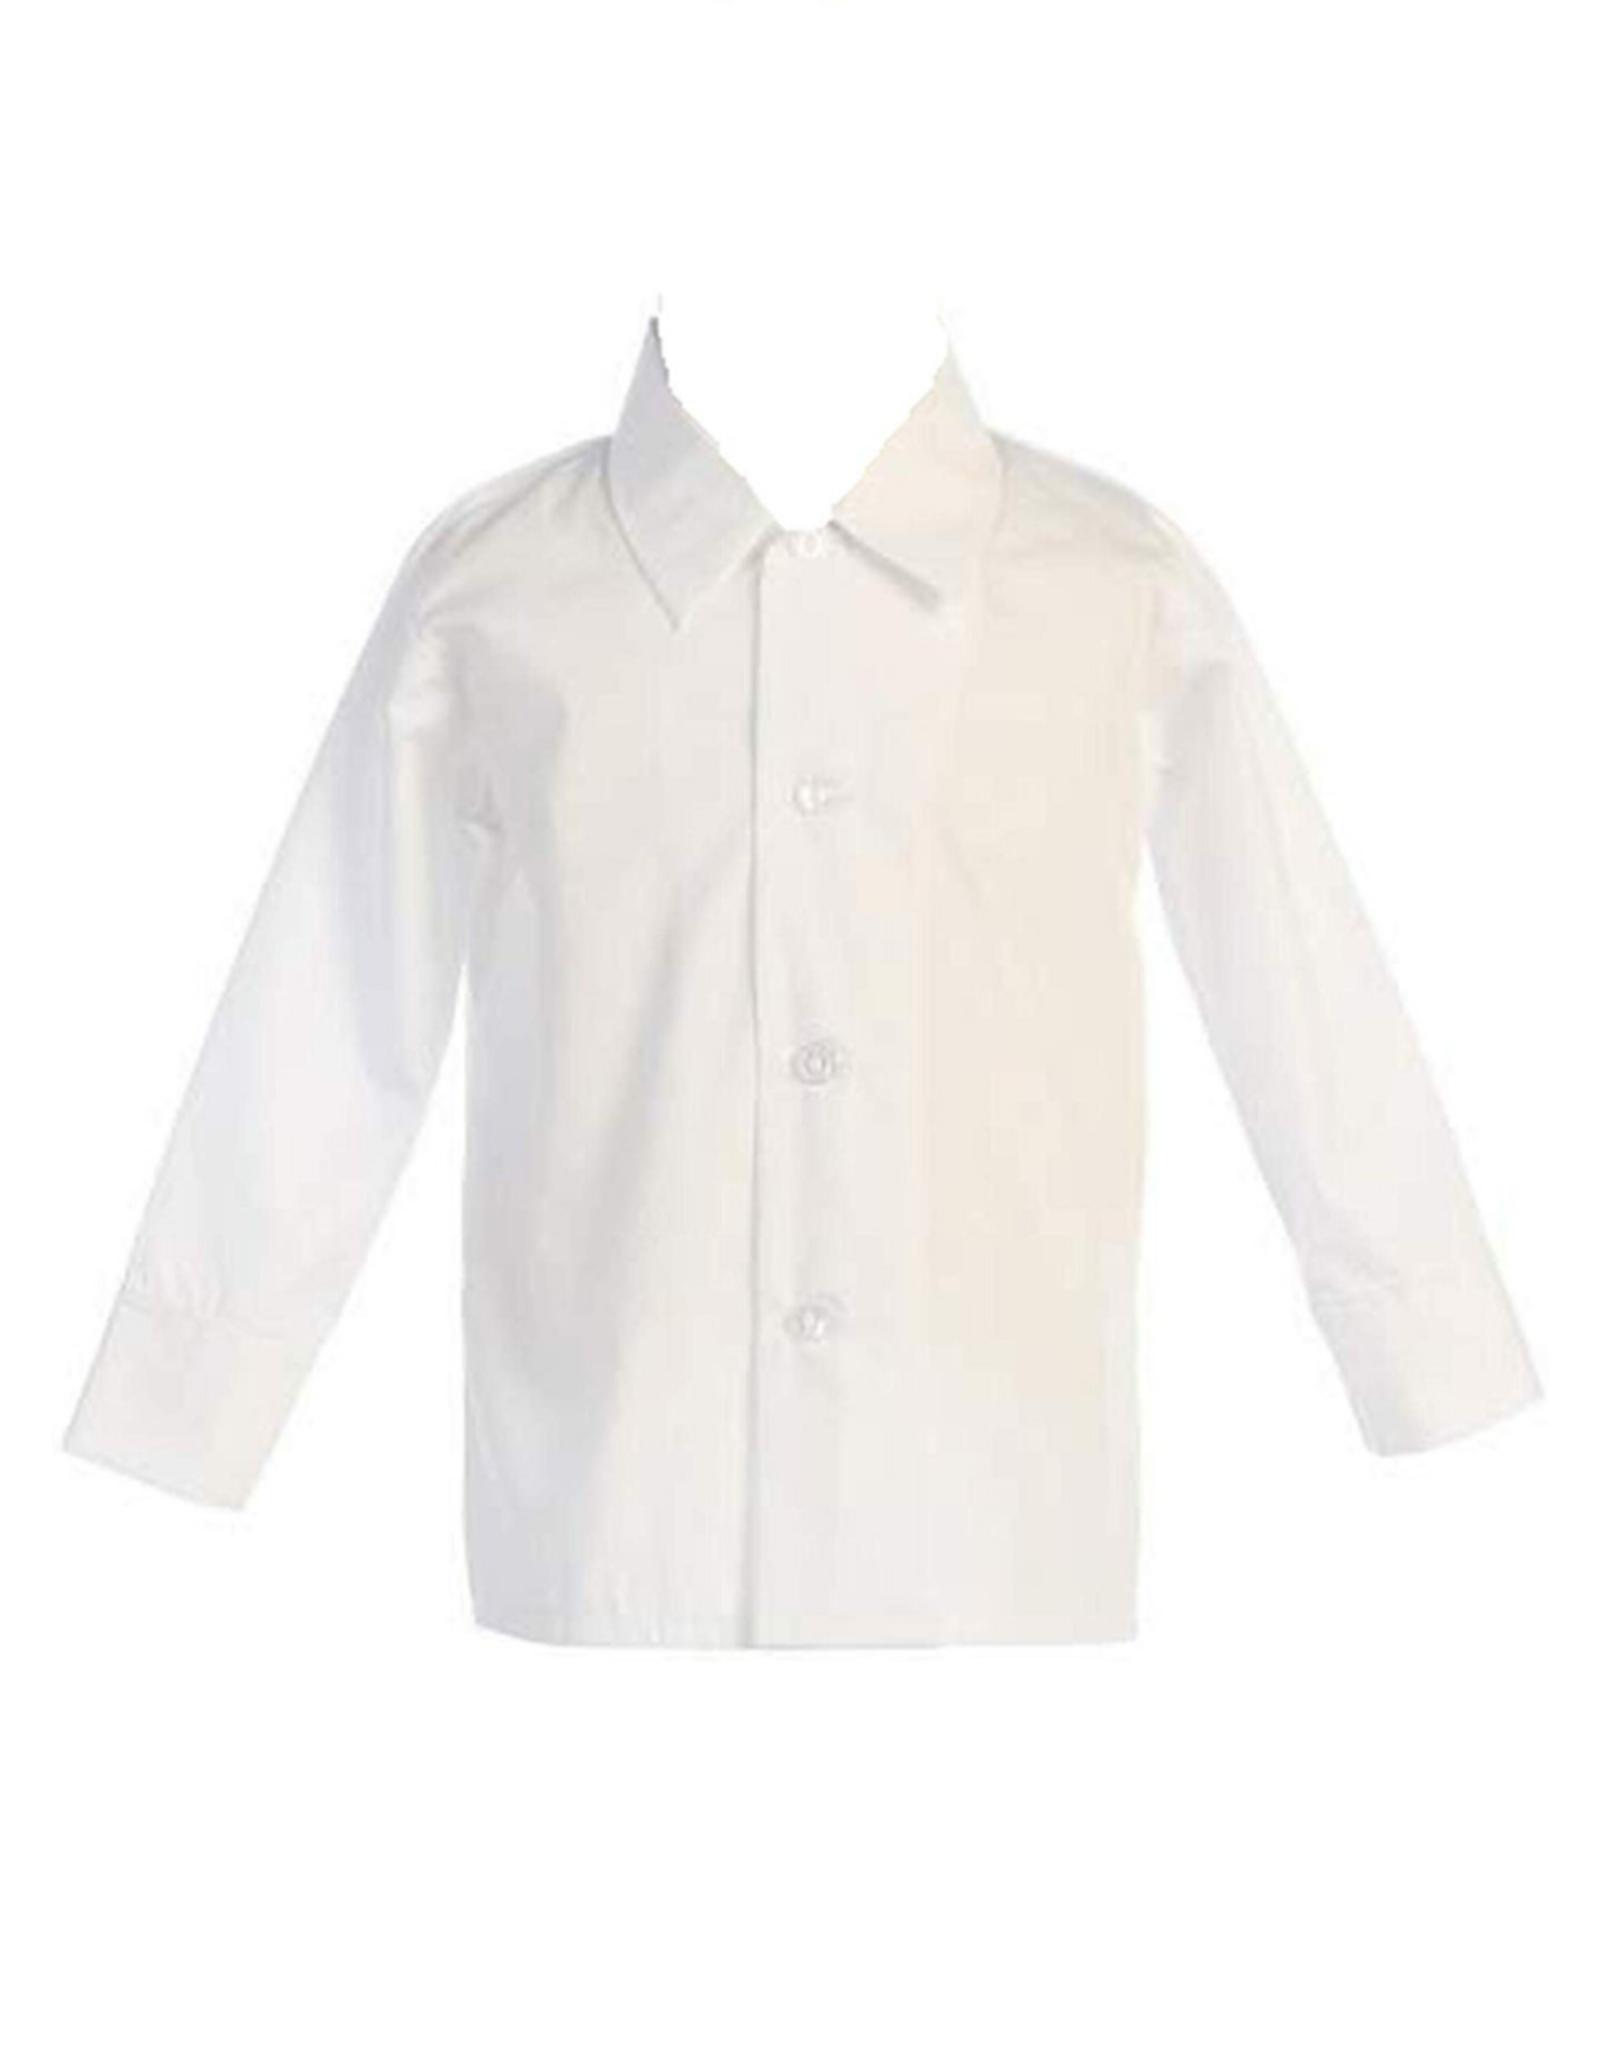 Lito Boy's Long Sleeve Shirt